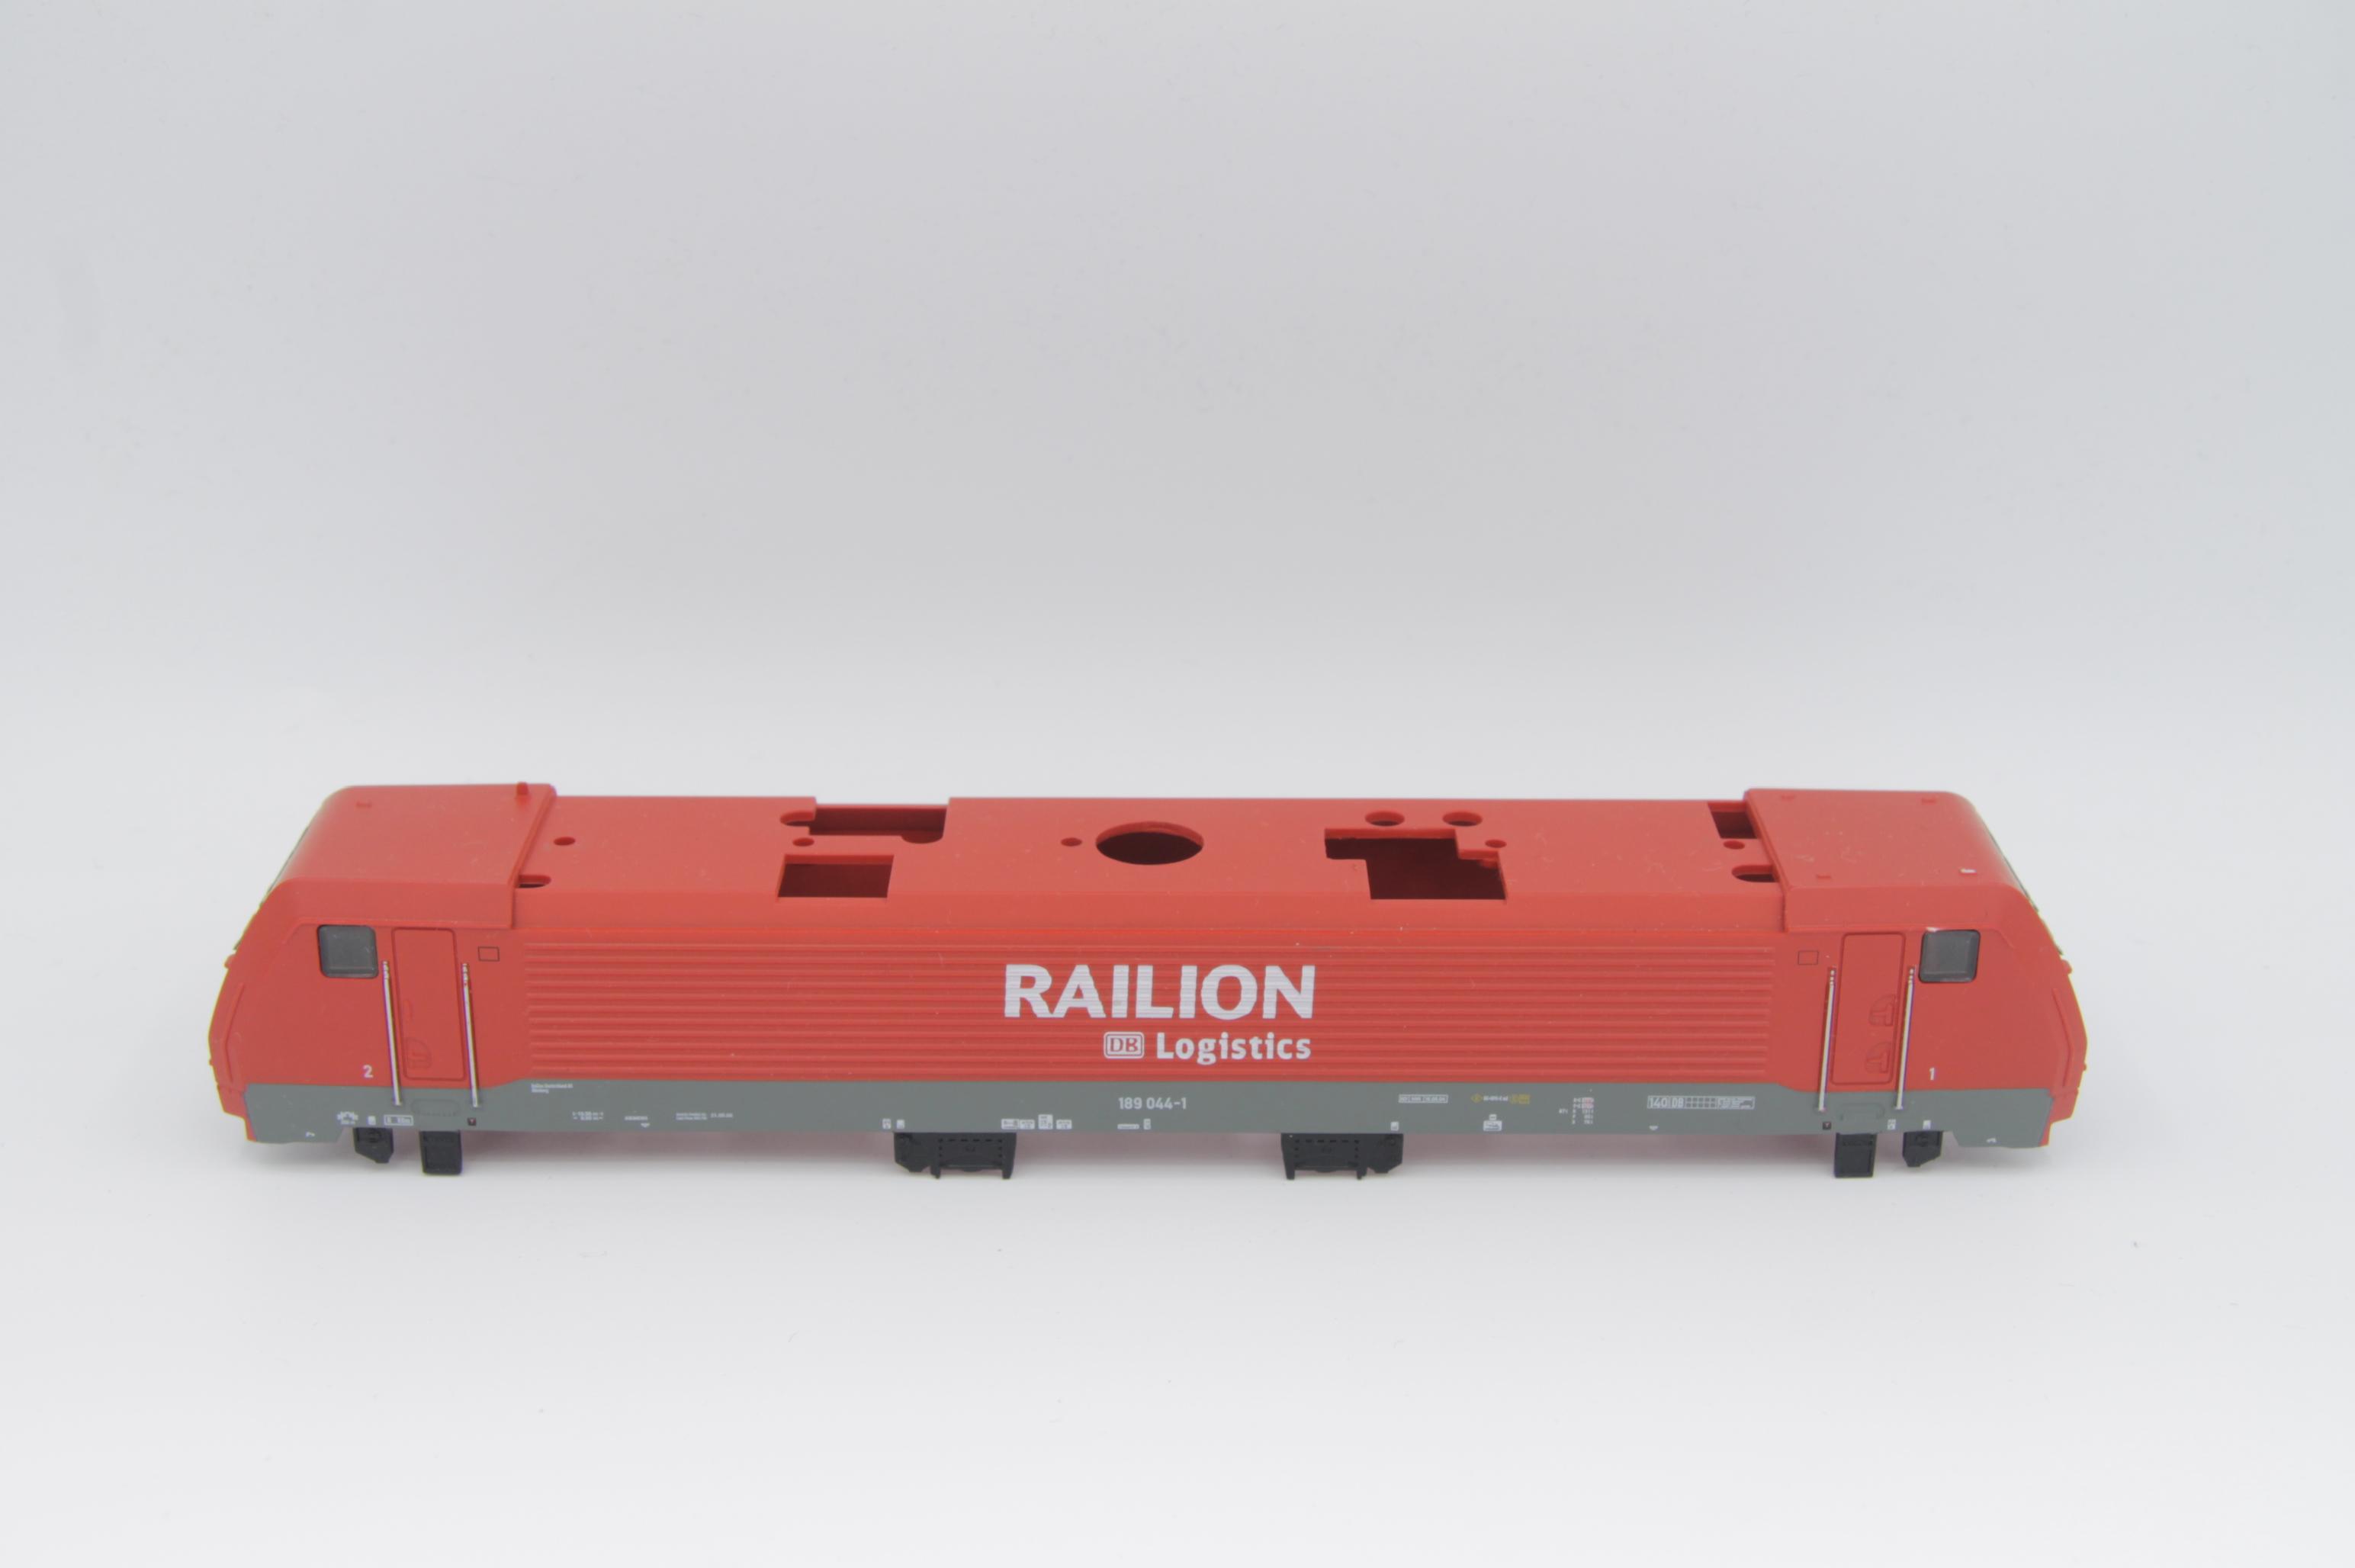 Ersatzteil Piko 189 044-1 Gehäuse Railion verkehrsrot